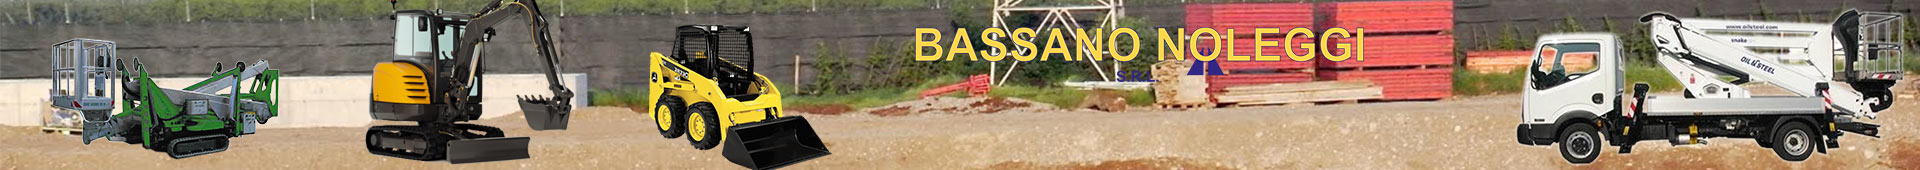 oleggio piattaforme aeree mini pale escavatori